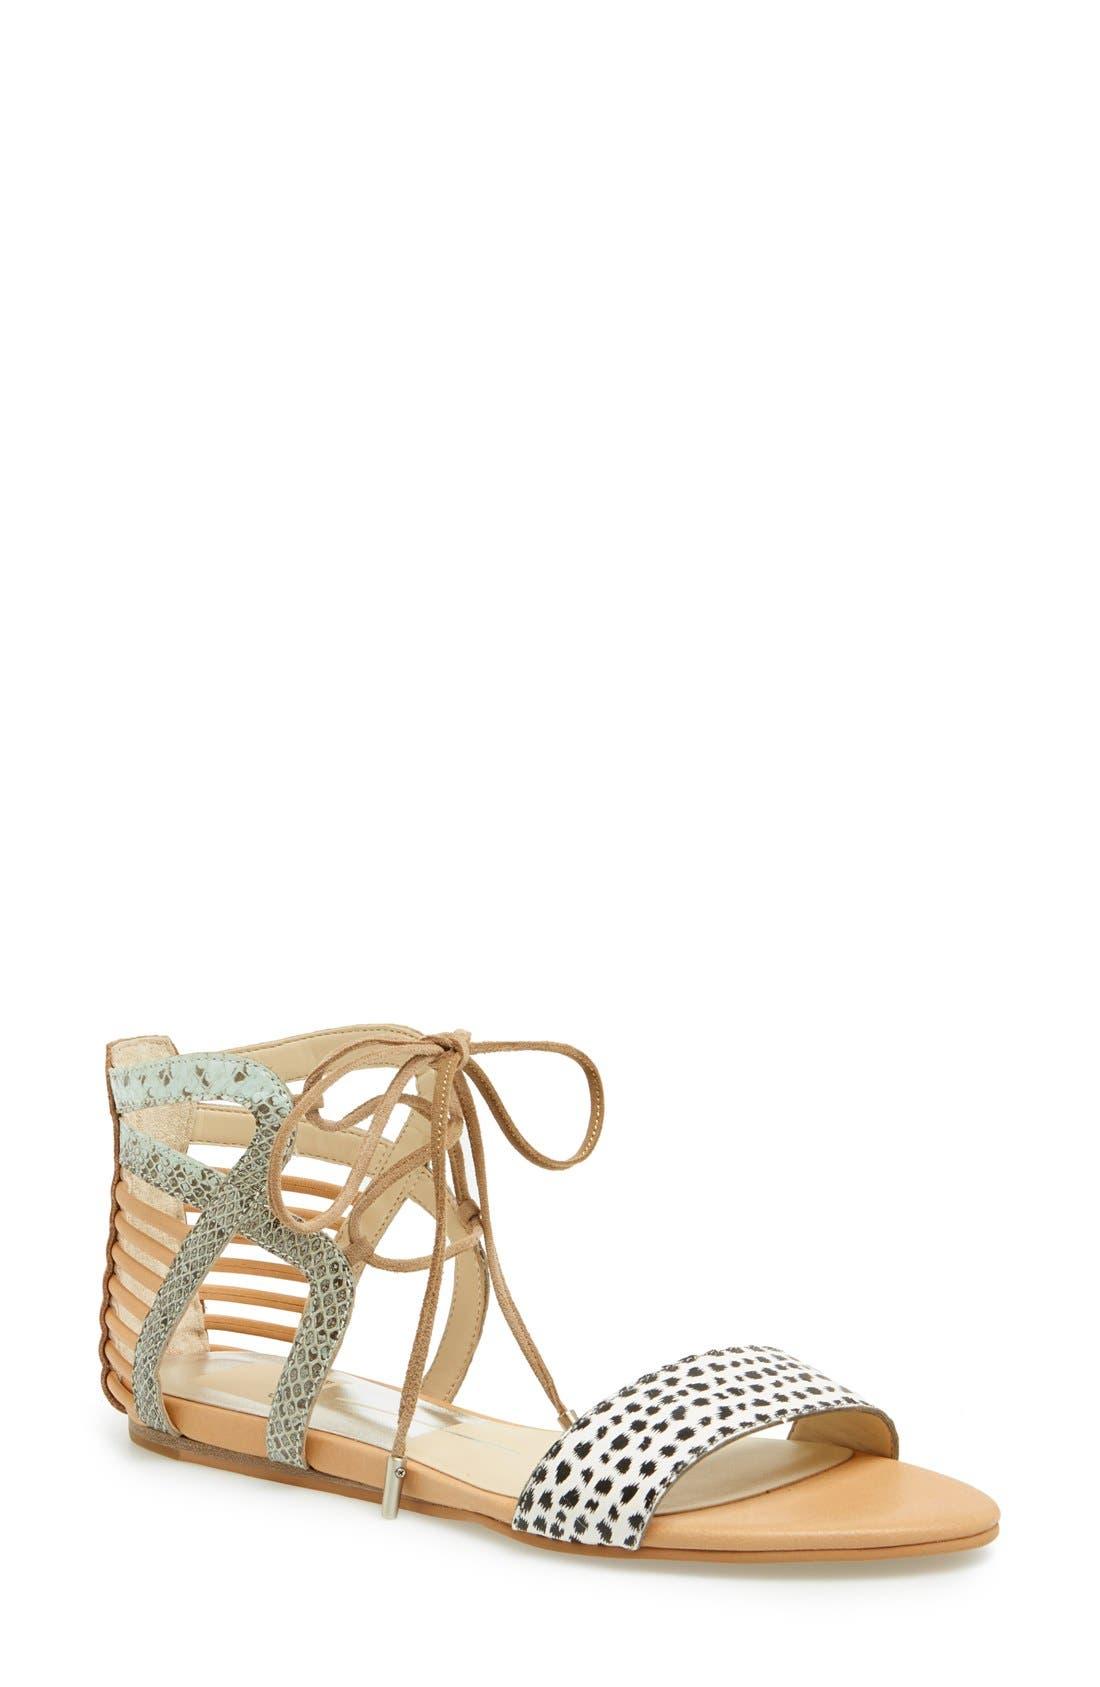 Main Image - Dolce Vita 'Ashtyn' Mixed Media Sandal (Women)